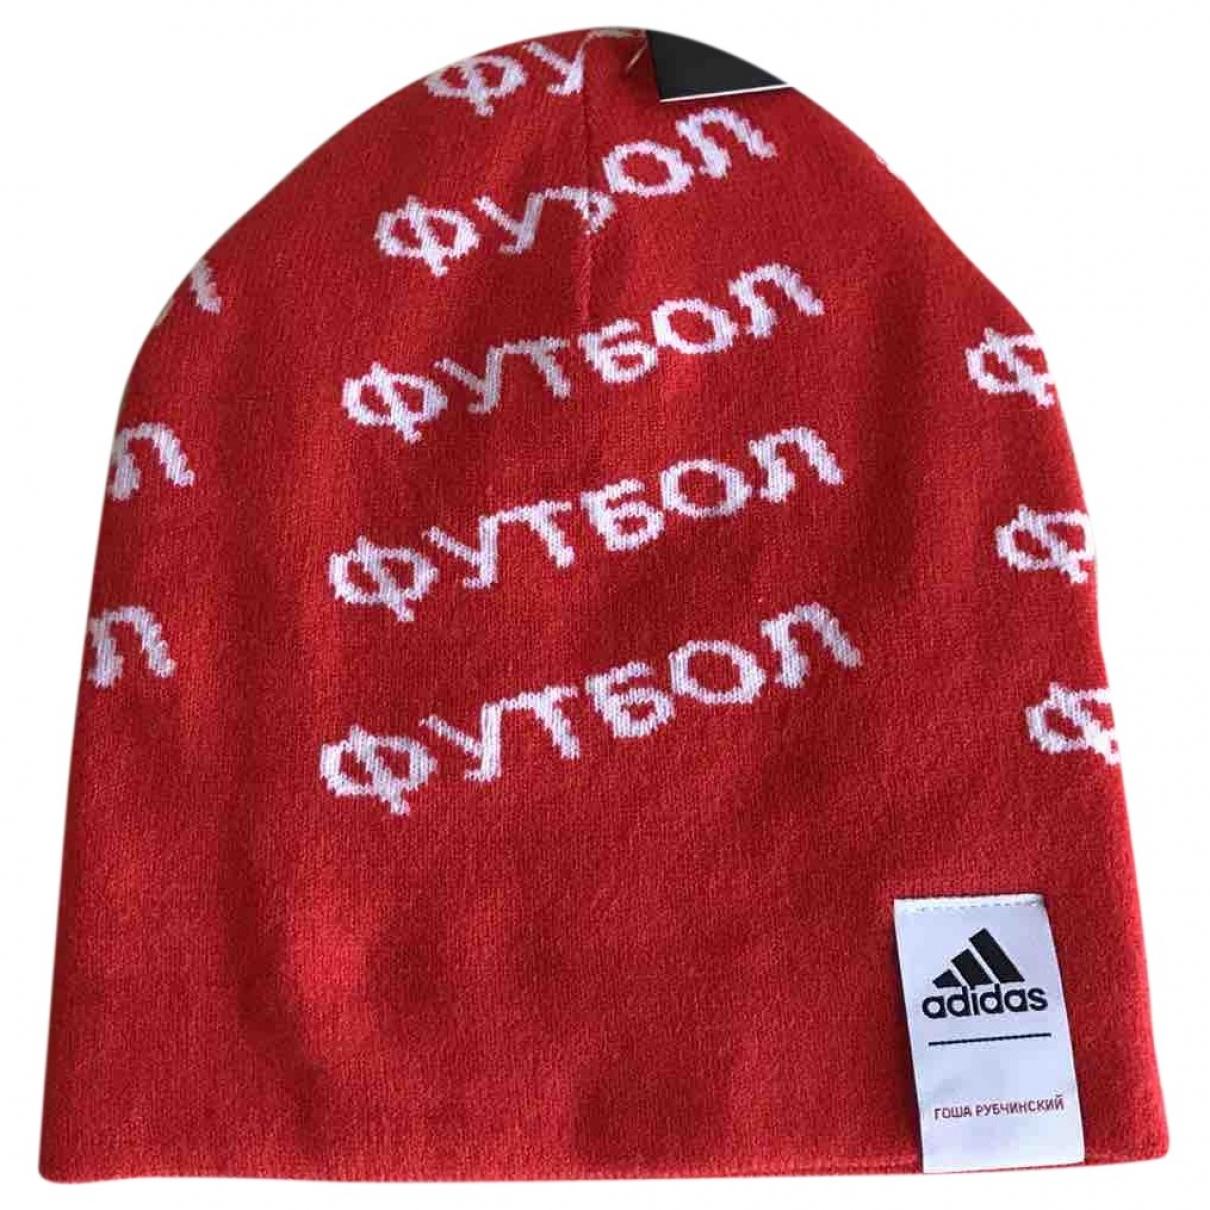 Adidas X Gosha Rubchinskiy \N Hut, Muetzen in  Rot Polyester